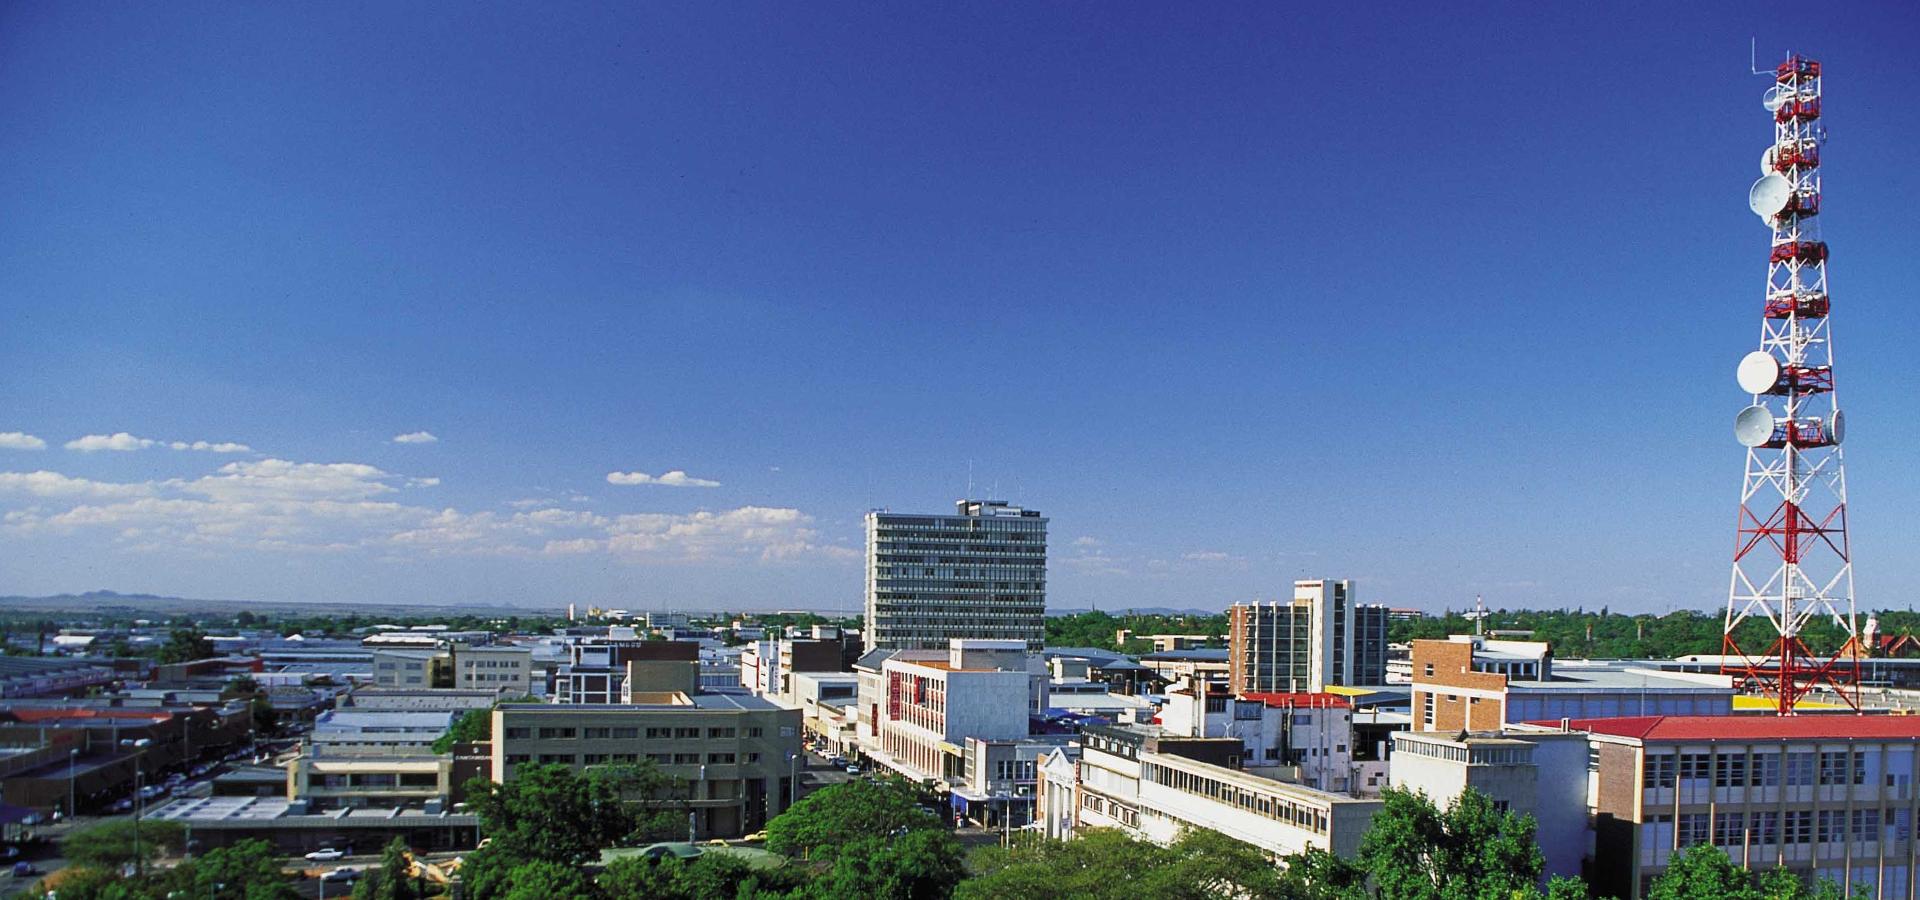 <b>Africa/Johannesburg/Limpopo</b>